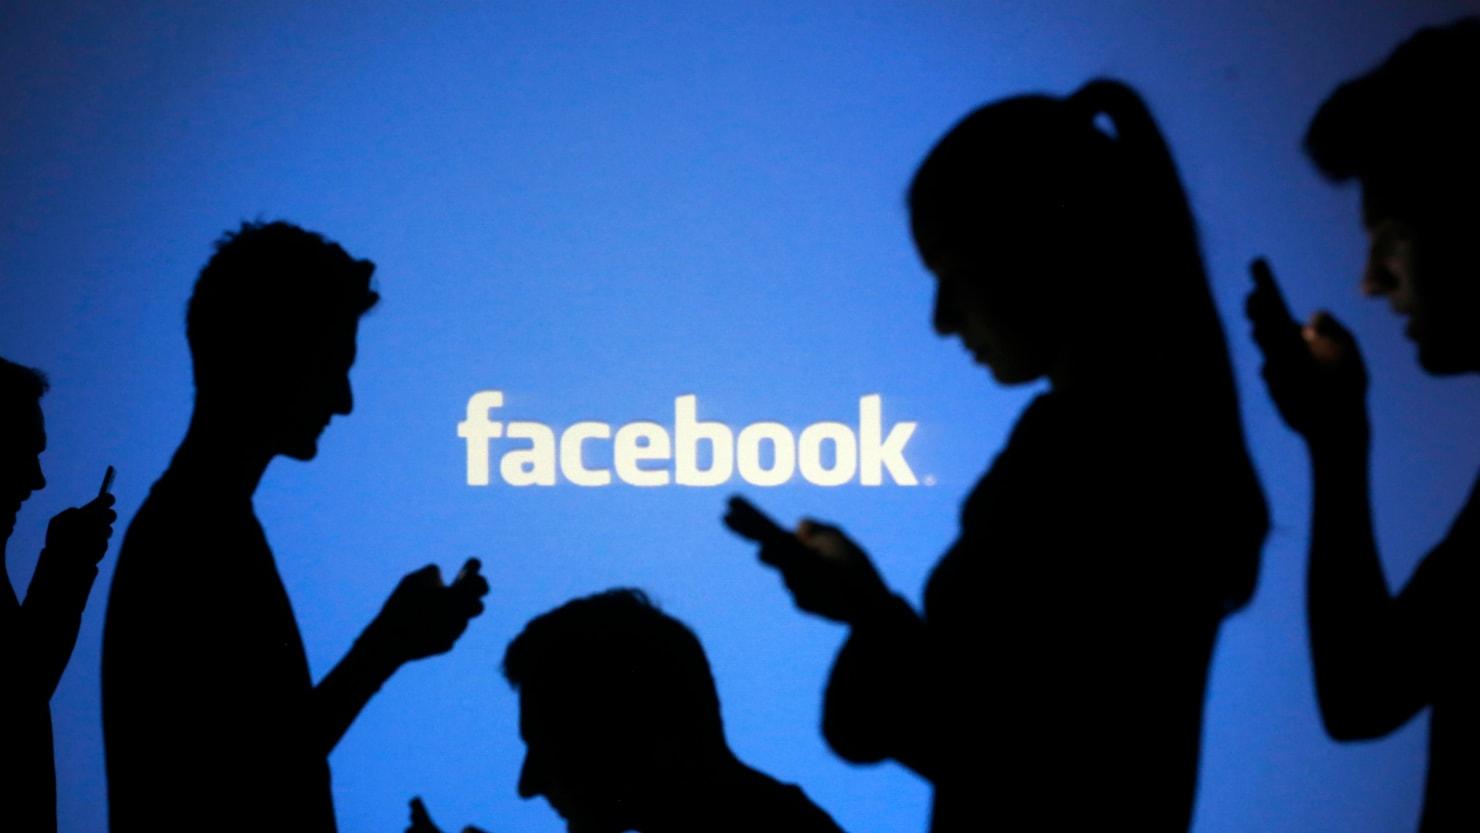 Facebook Blocks Dozens of Suspicious Accounts After Law Enforcement Tip